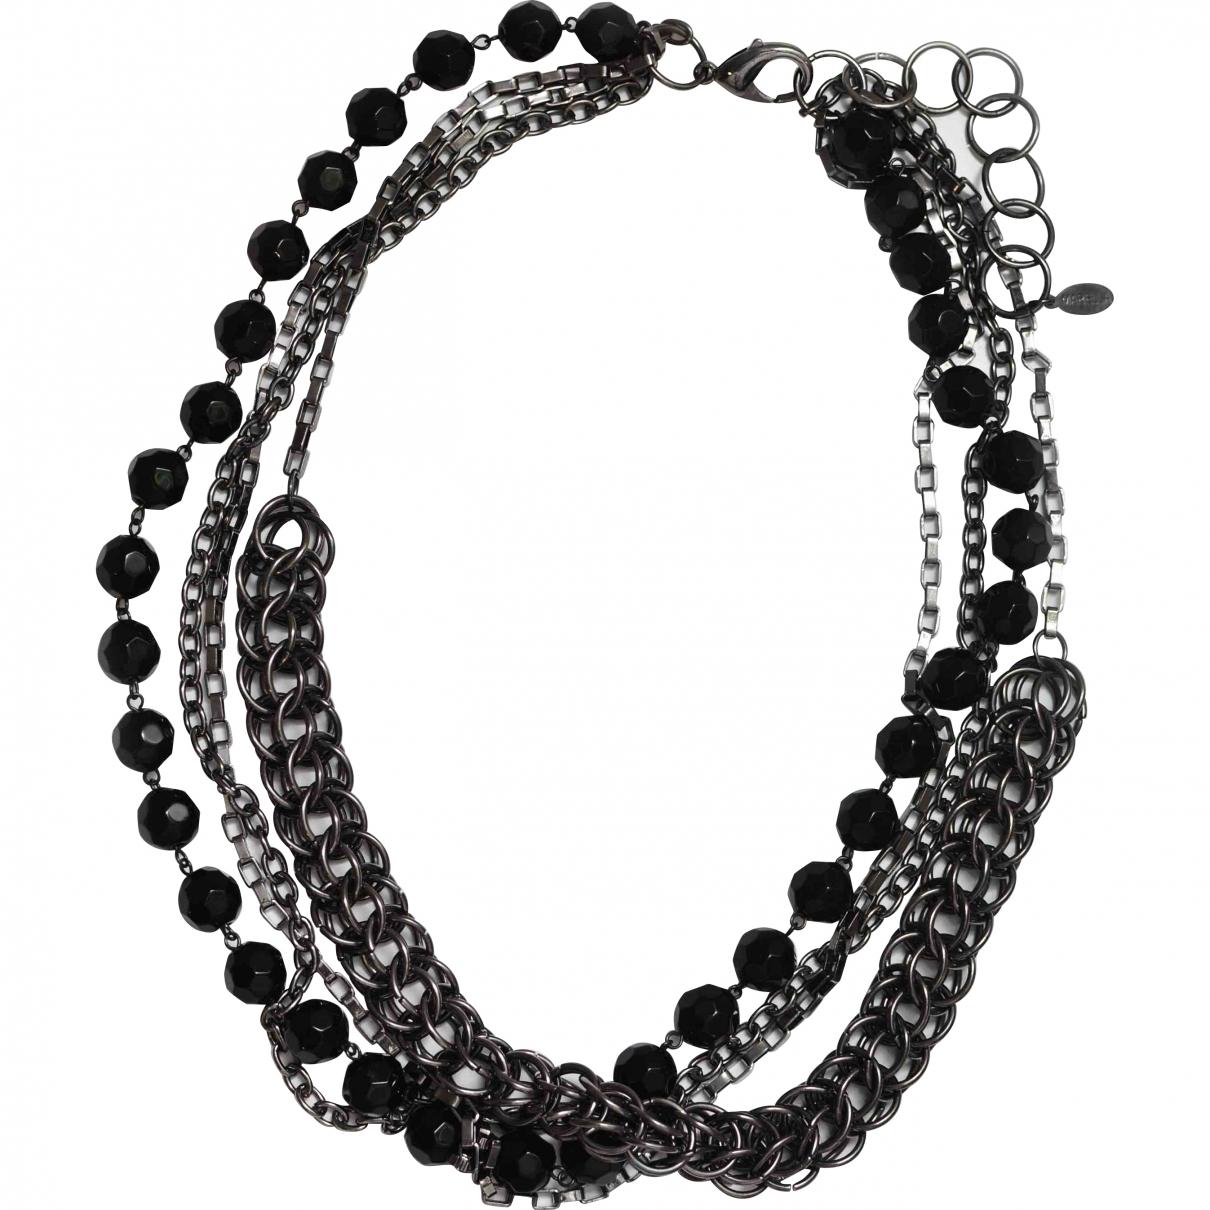 Marella \N Black Metal necklace for Women \N